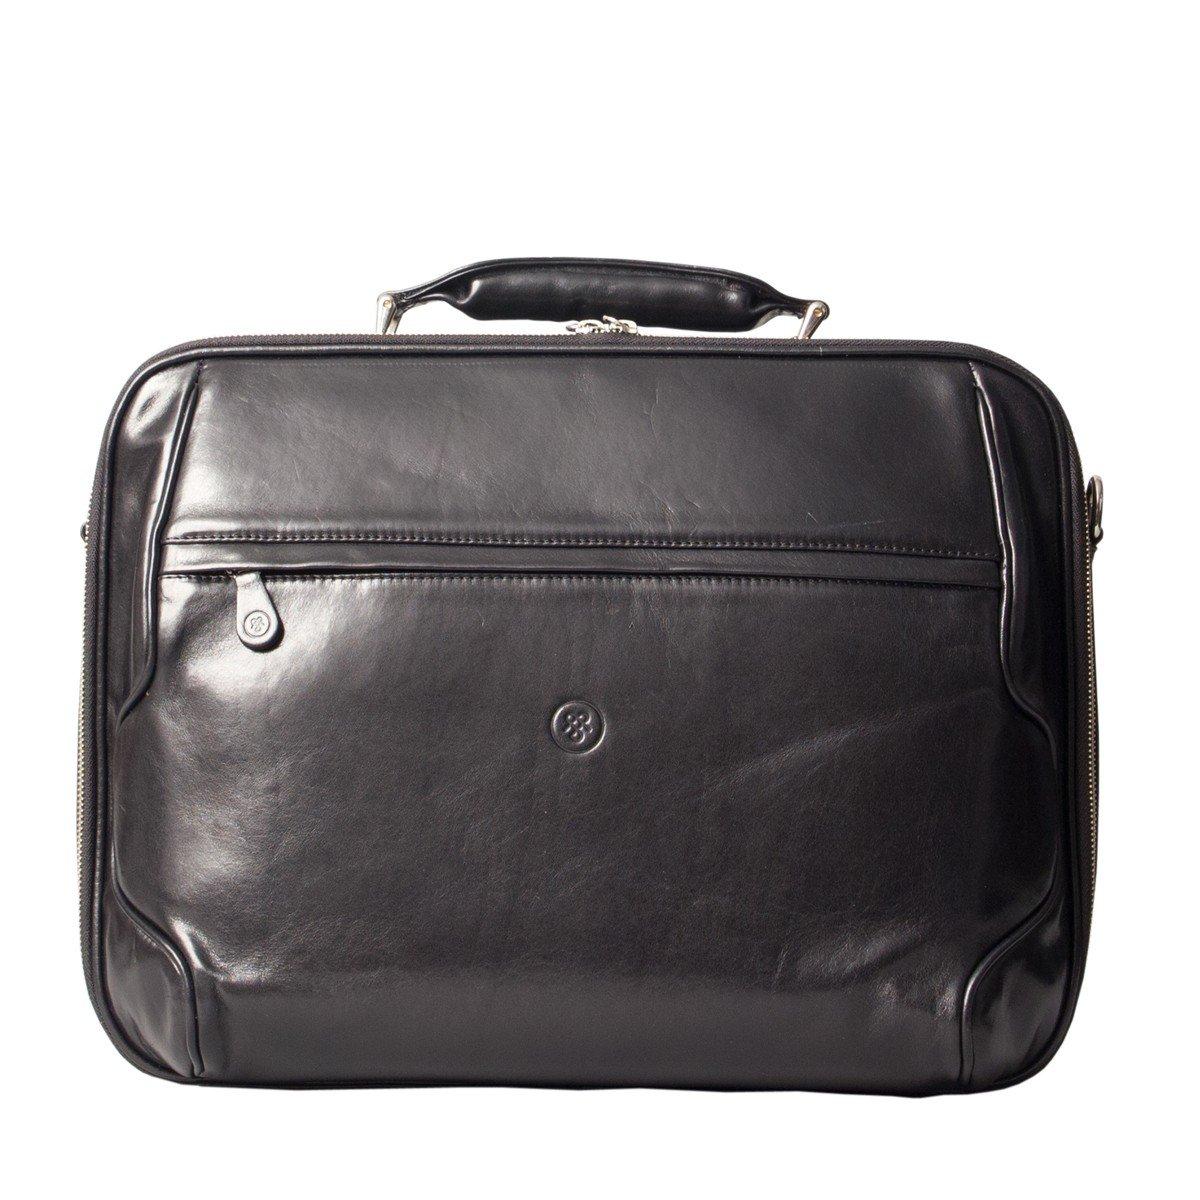 Maxwell Scott Luxury Black Leather Laptop Case (The Volterra) - One Size